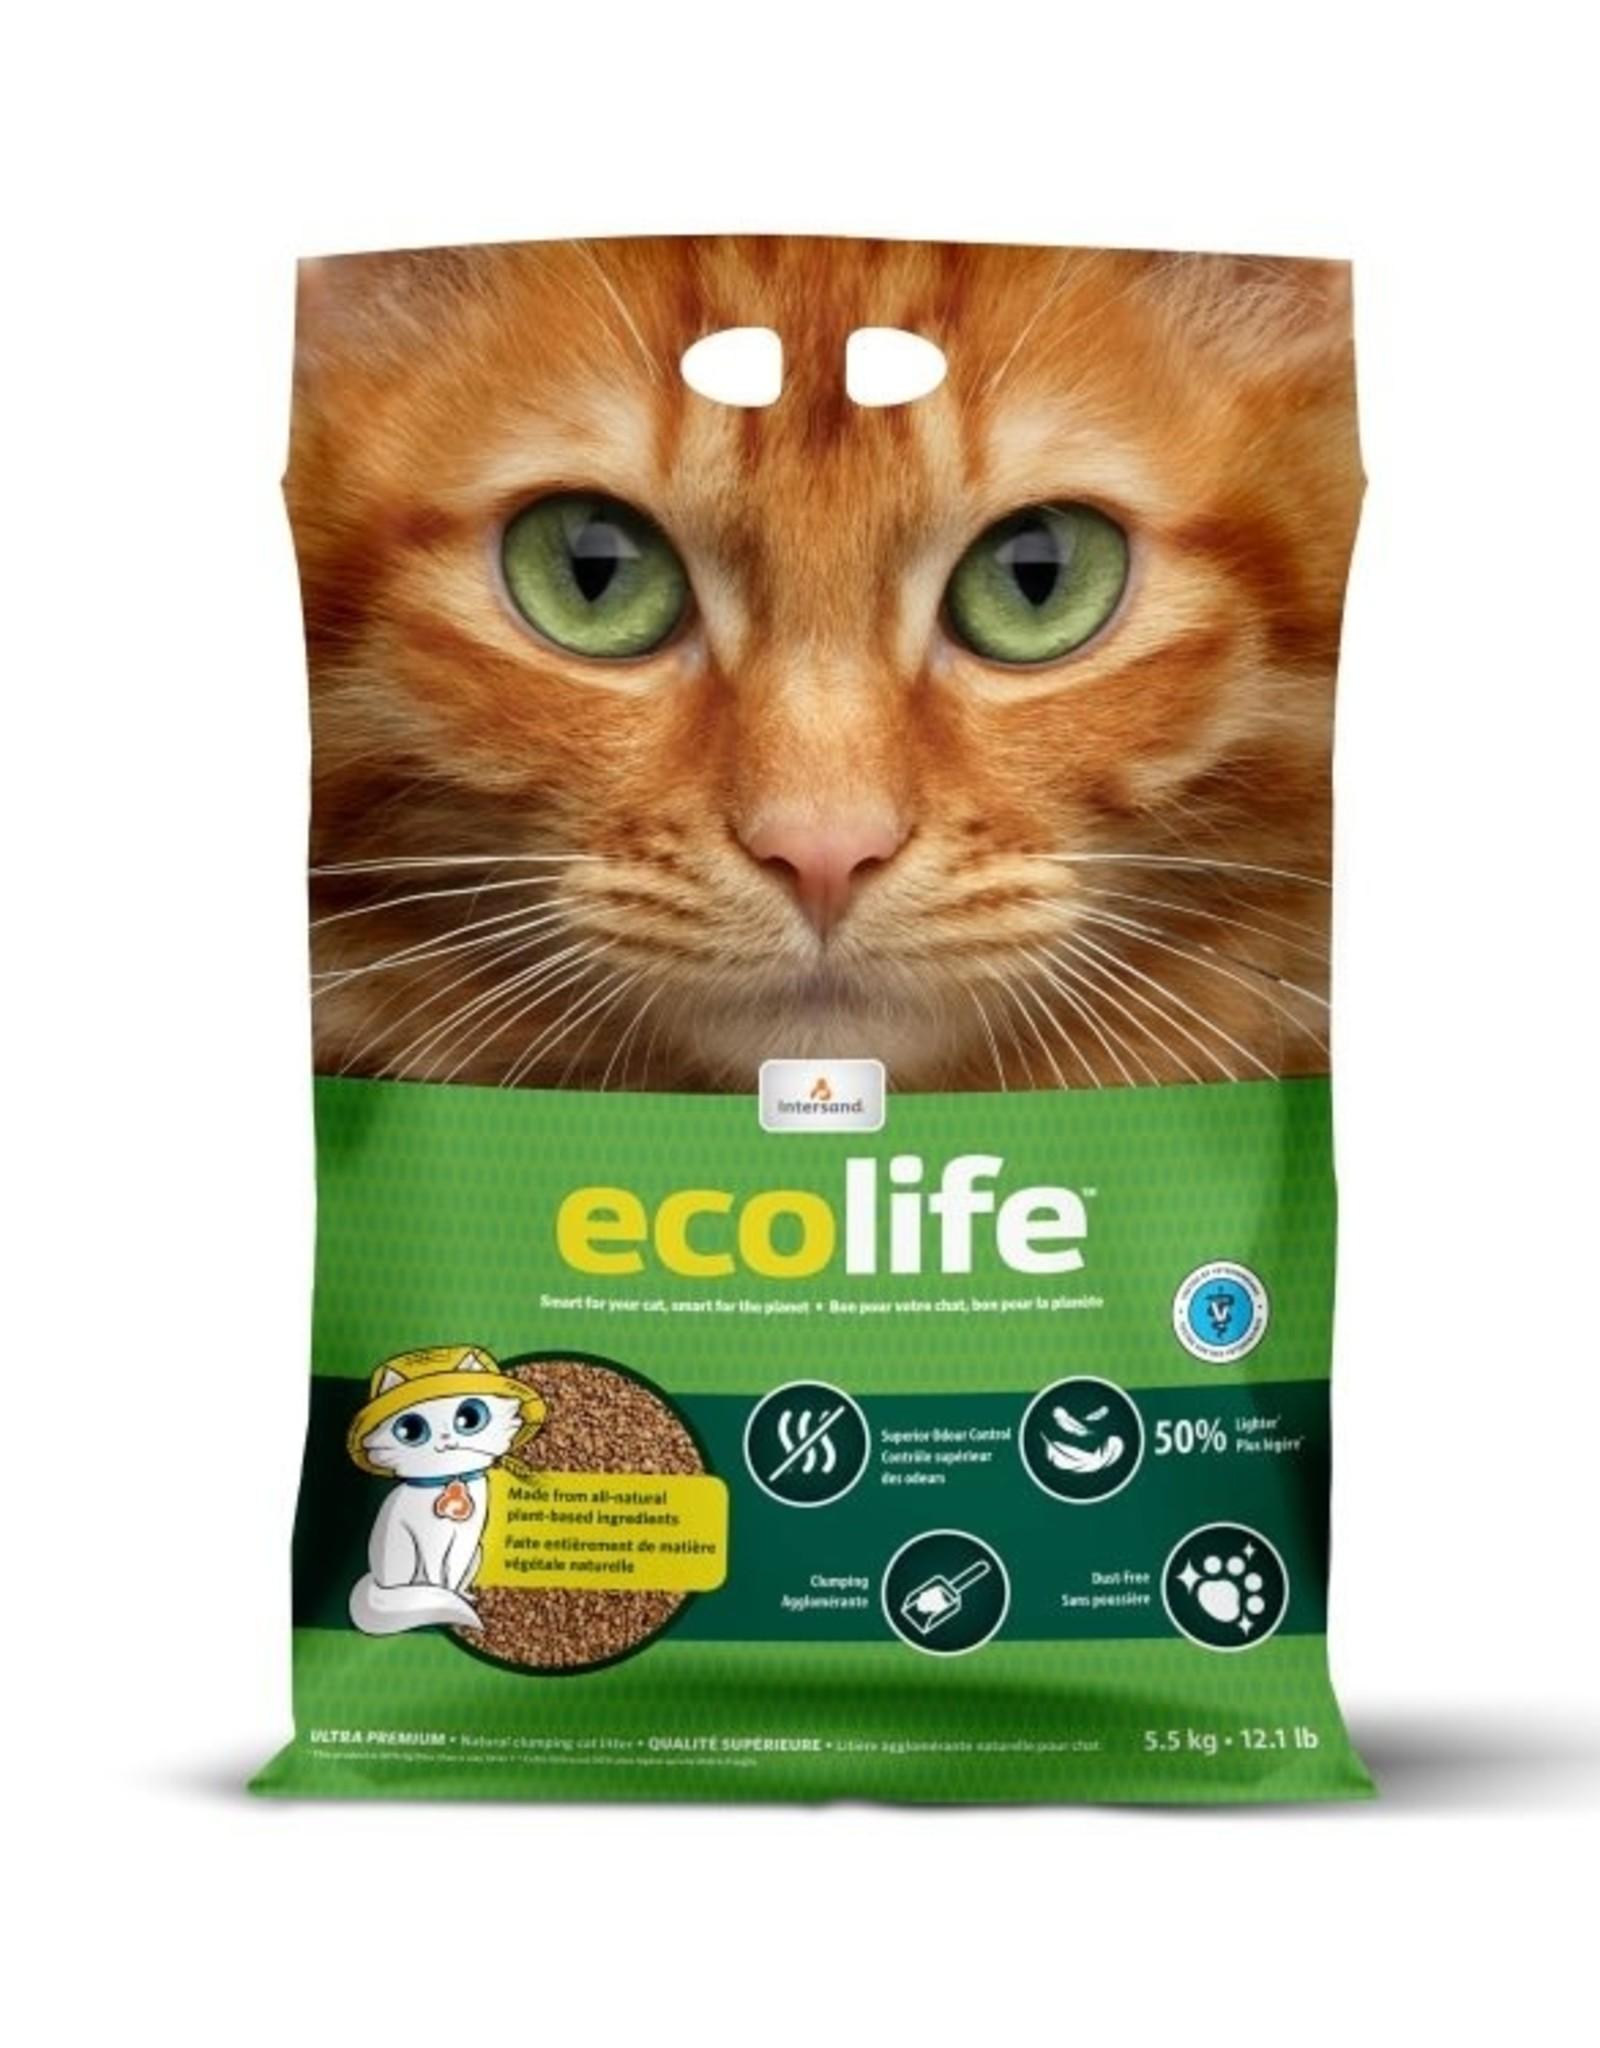 INTERSAND Ecolife Natural Clumping Litter 5.5kg